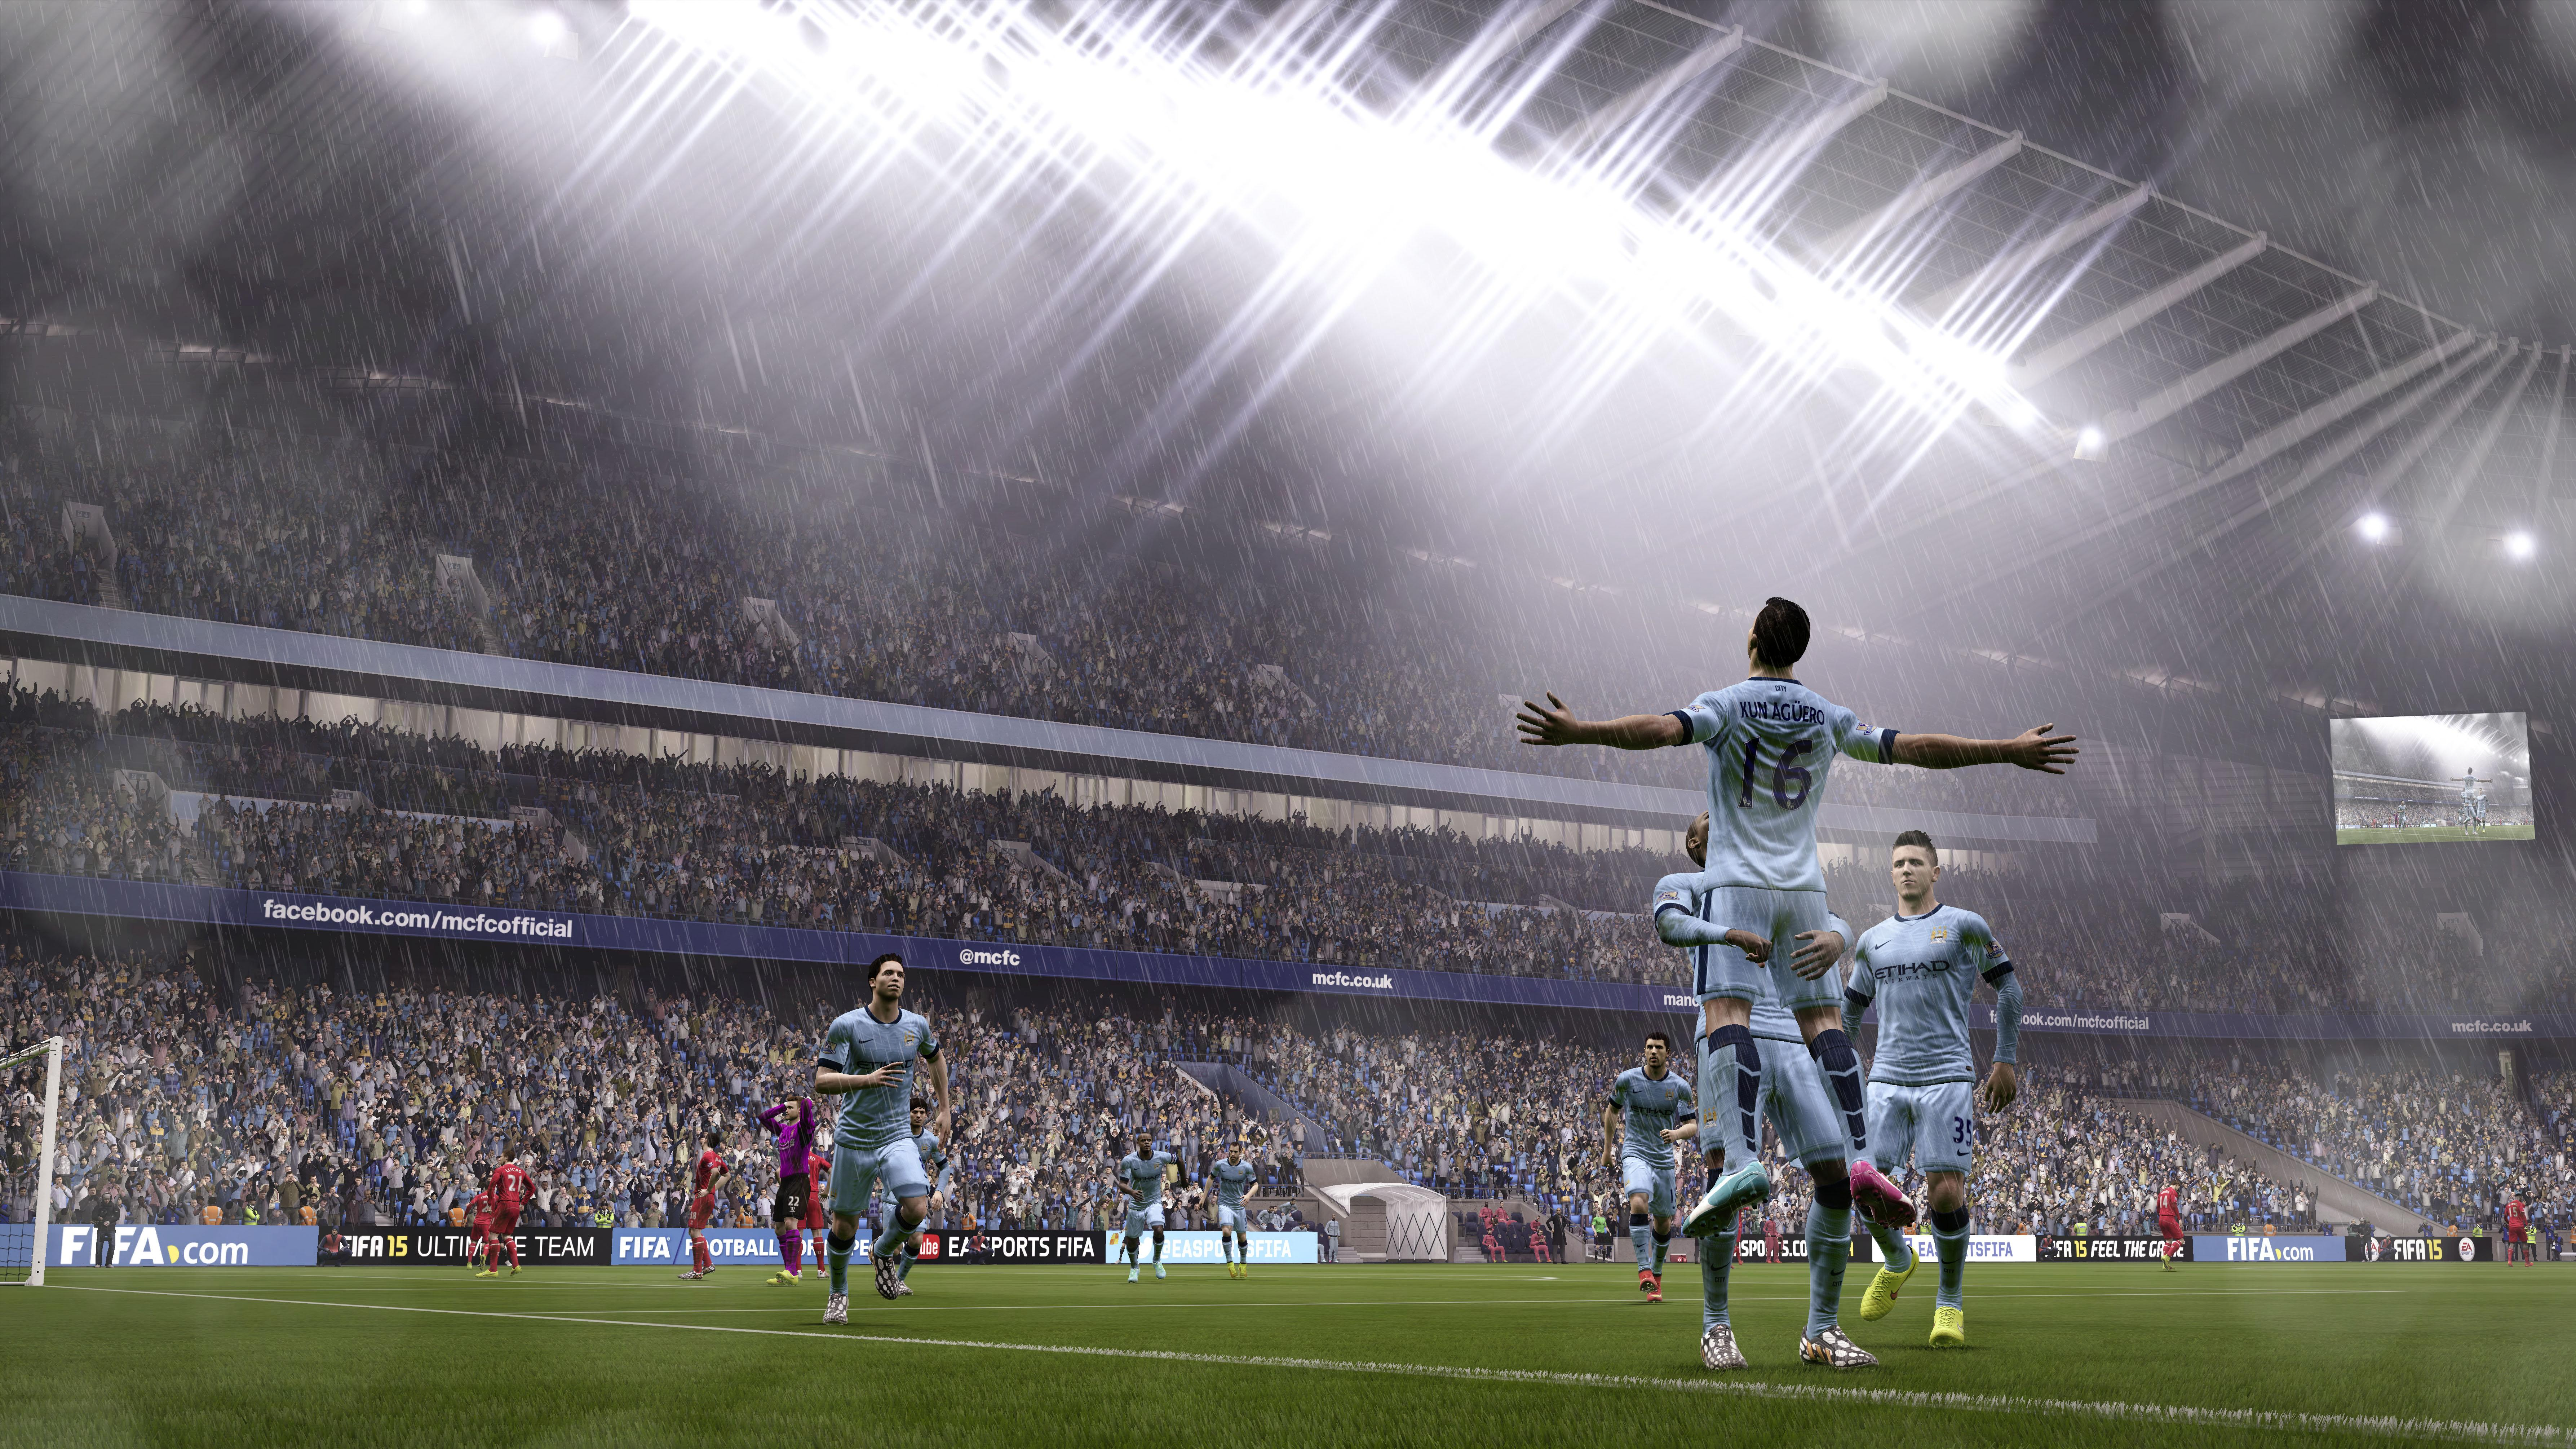 Amazon com: FIFA 15 - PlayStation 4: Electronic Arts: Video